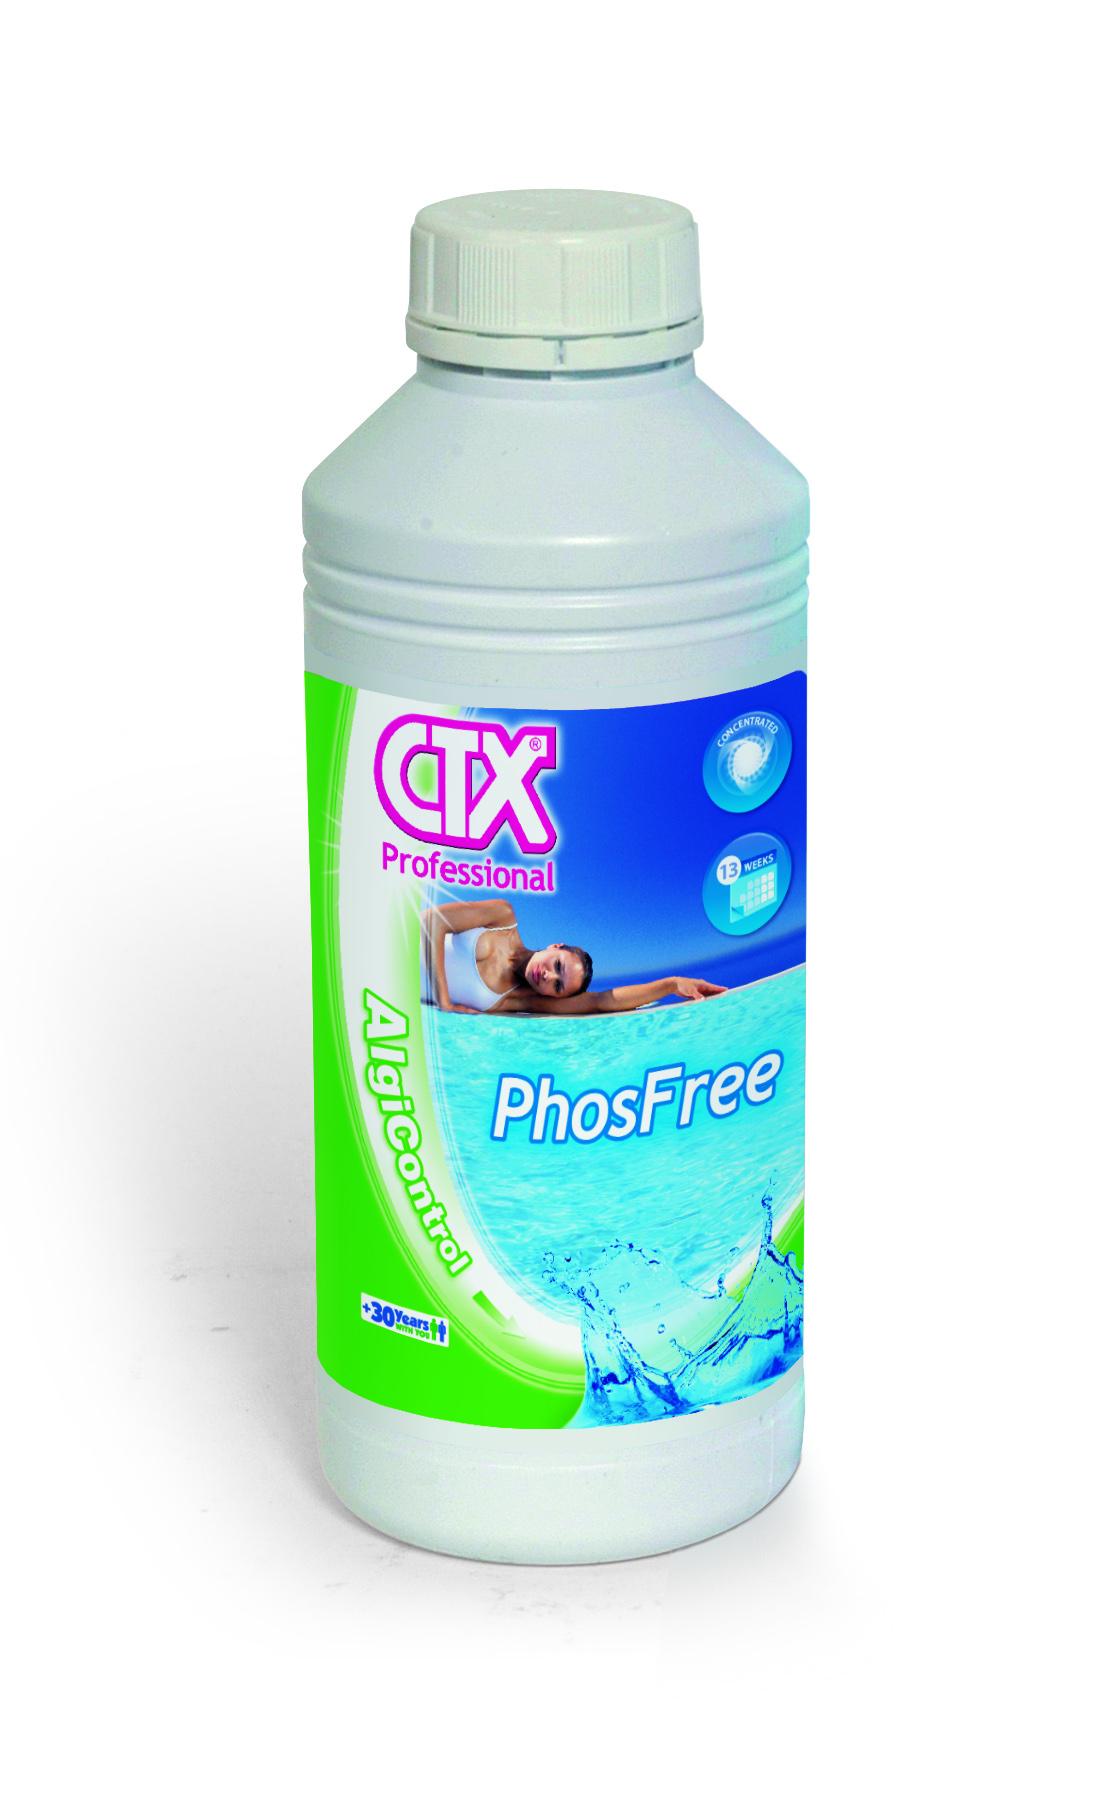 CTX-Phosfree น้ำยากำจัดอาหารของตะไคร่ ยับยั้งตะไคร่ไม่ให้เจริญเติบโต 1 ลิตร